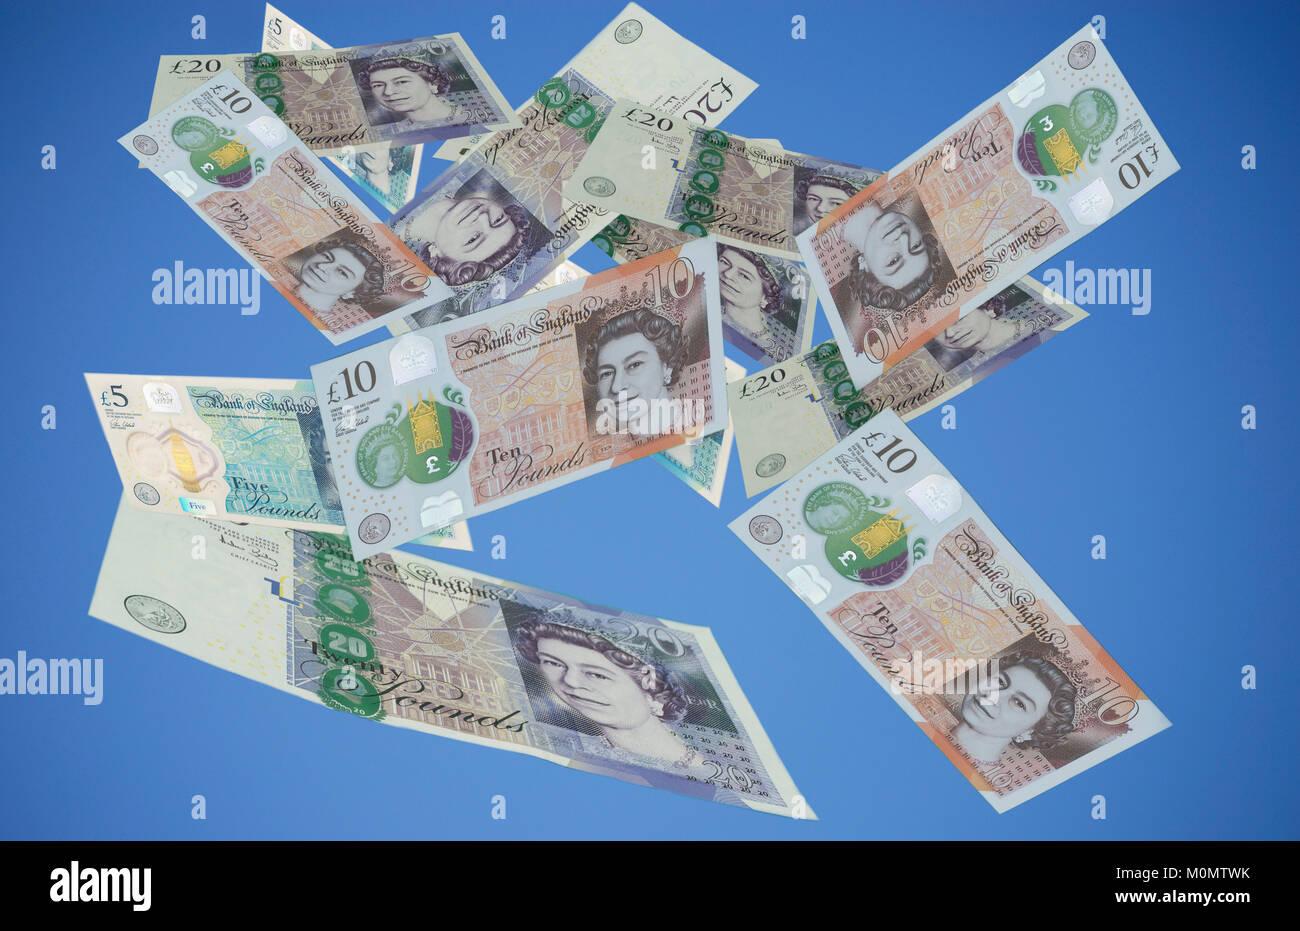 Falling pounds - Stock Image